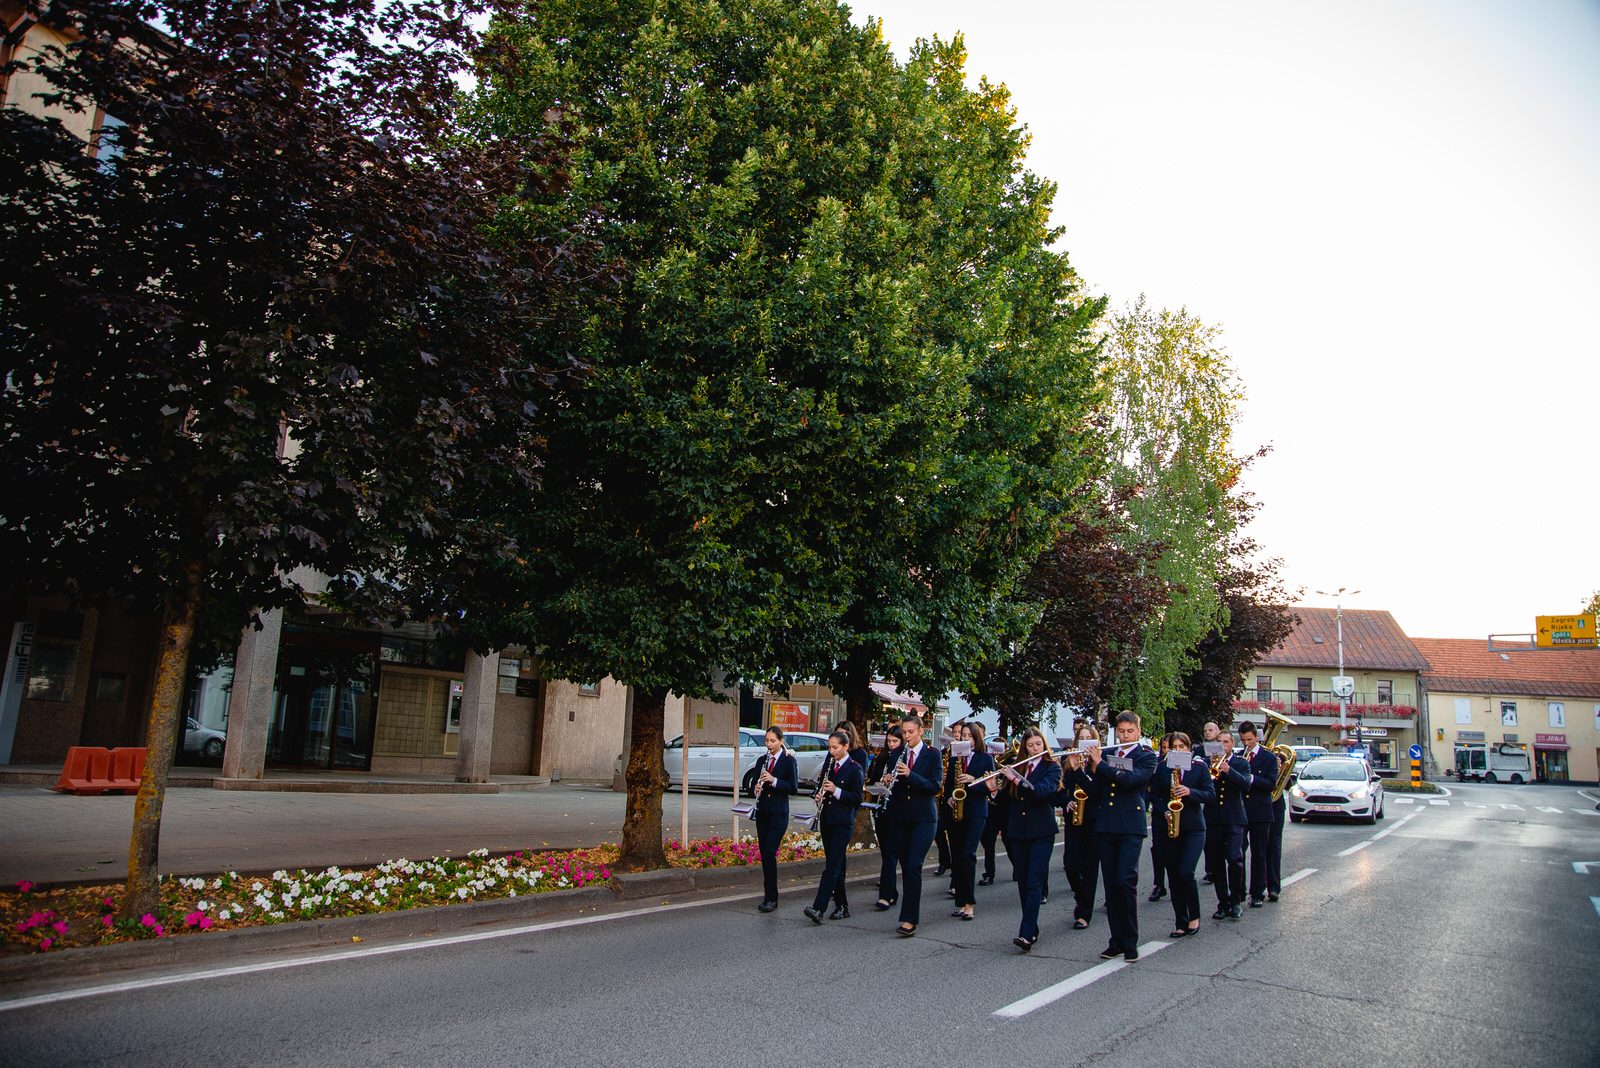 likaclub_budnica puhačkog orkestra povodom dana grada_22_7_2020 (15)